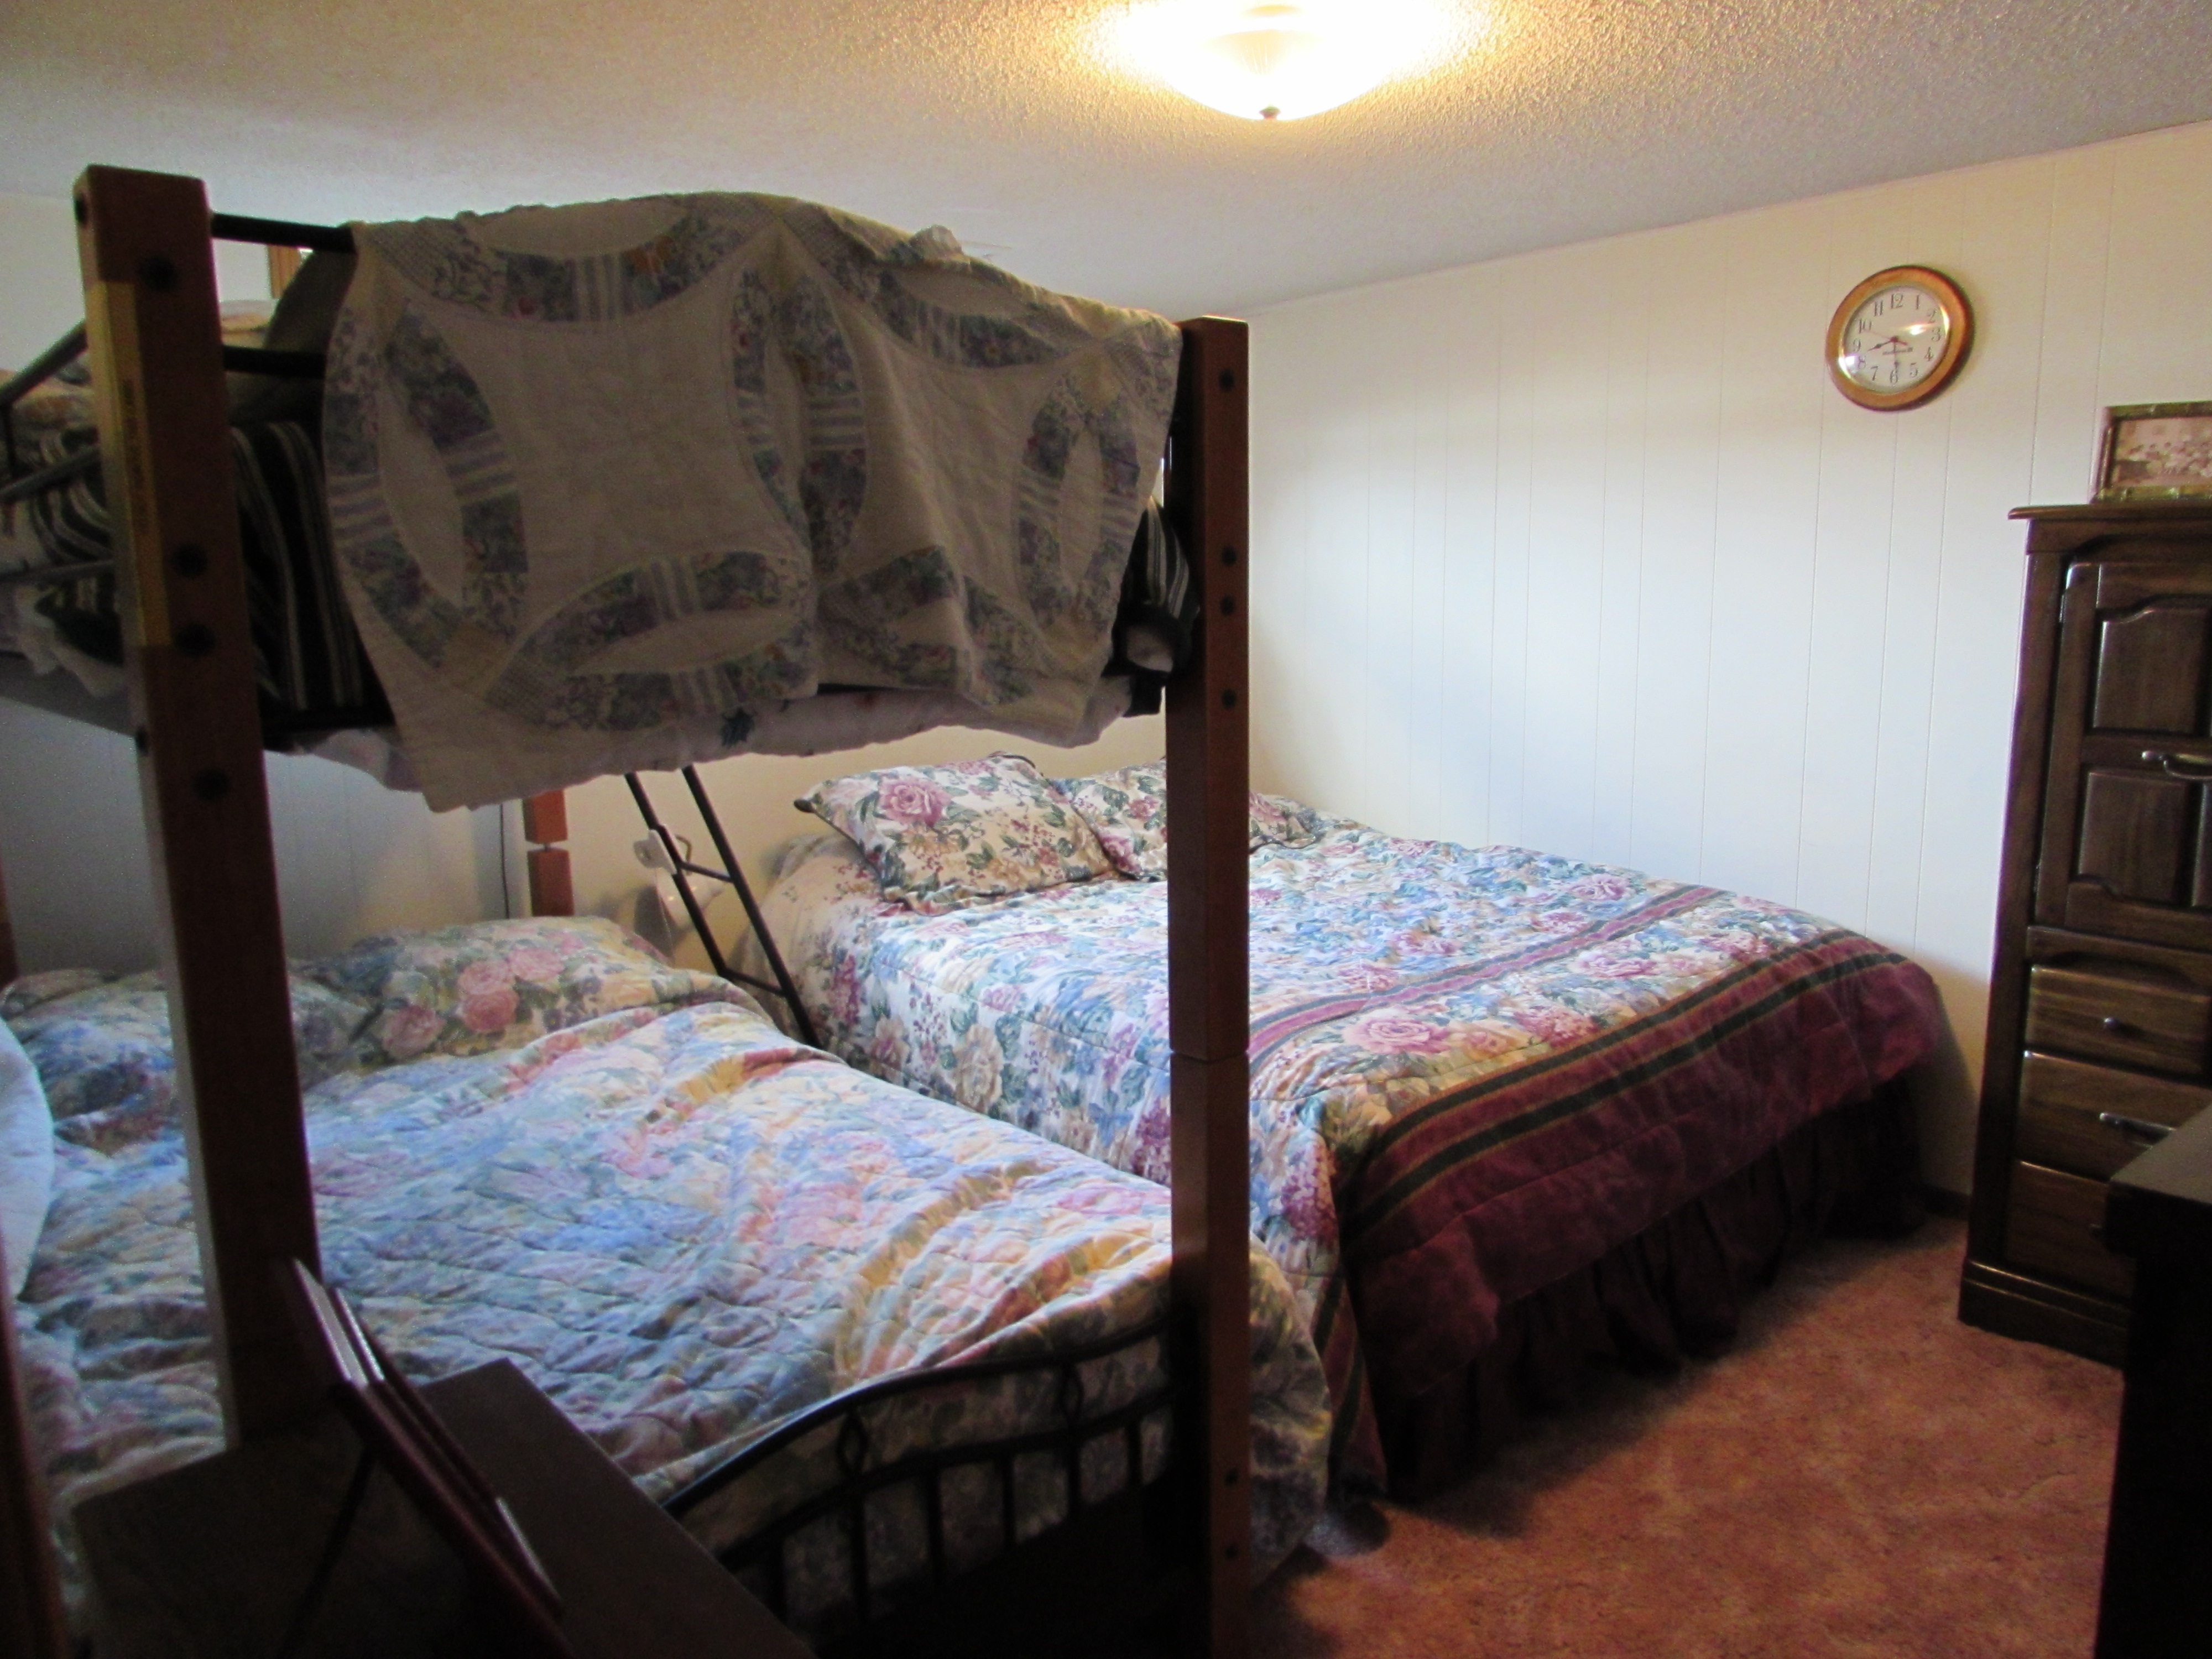 basement bed 2 before.JPG